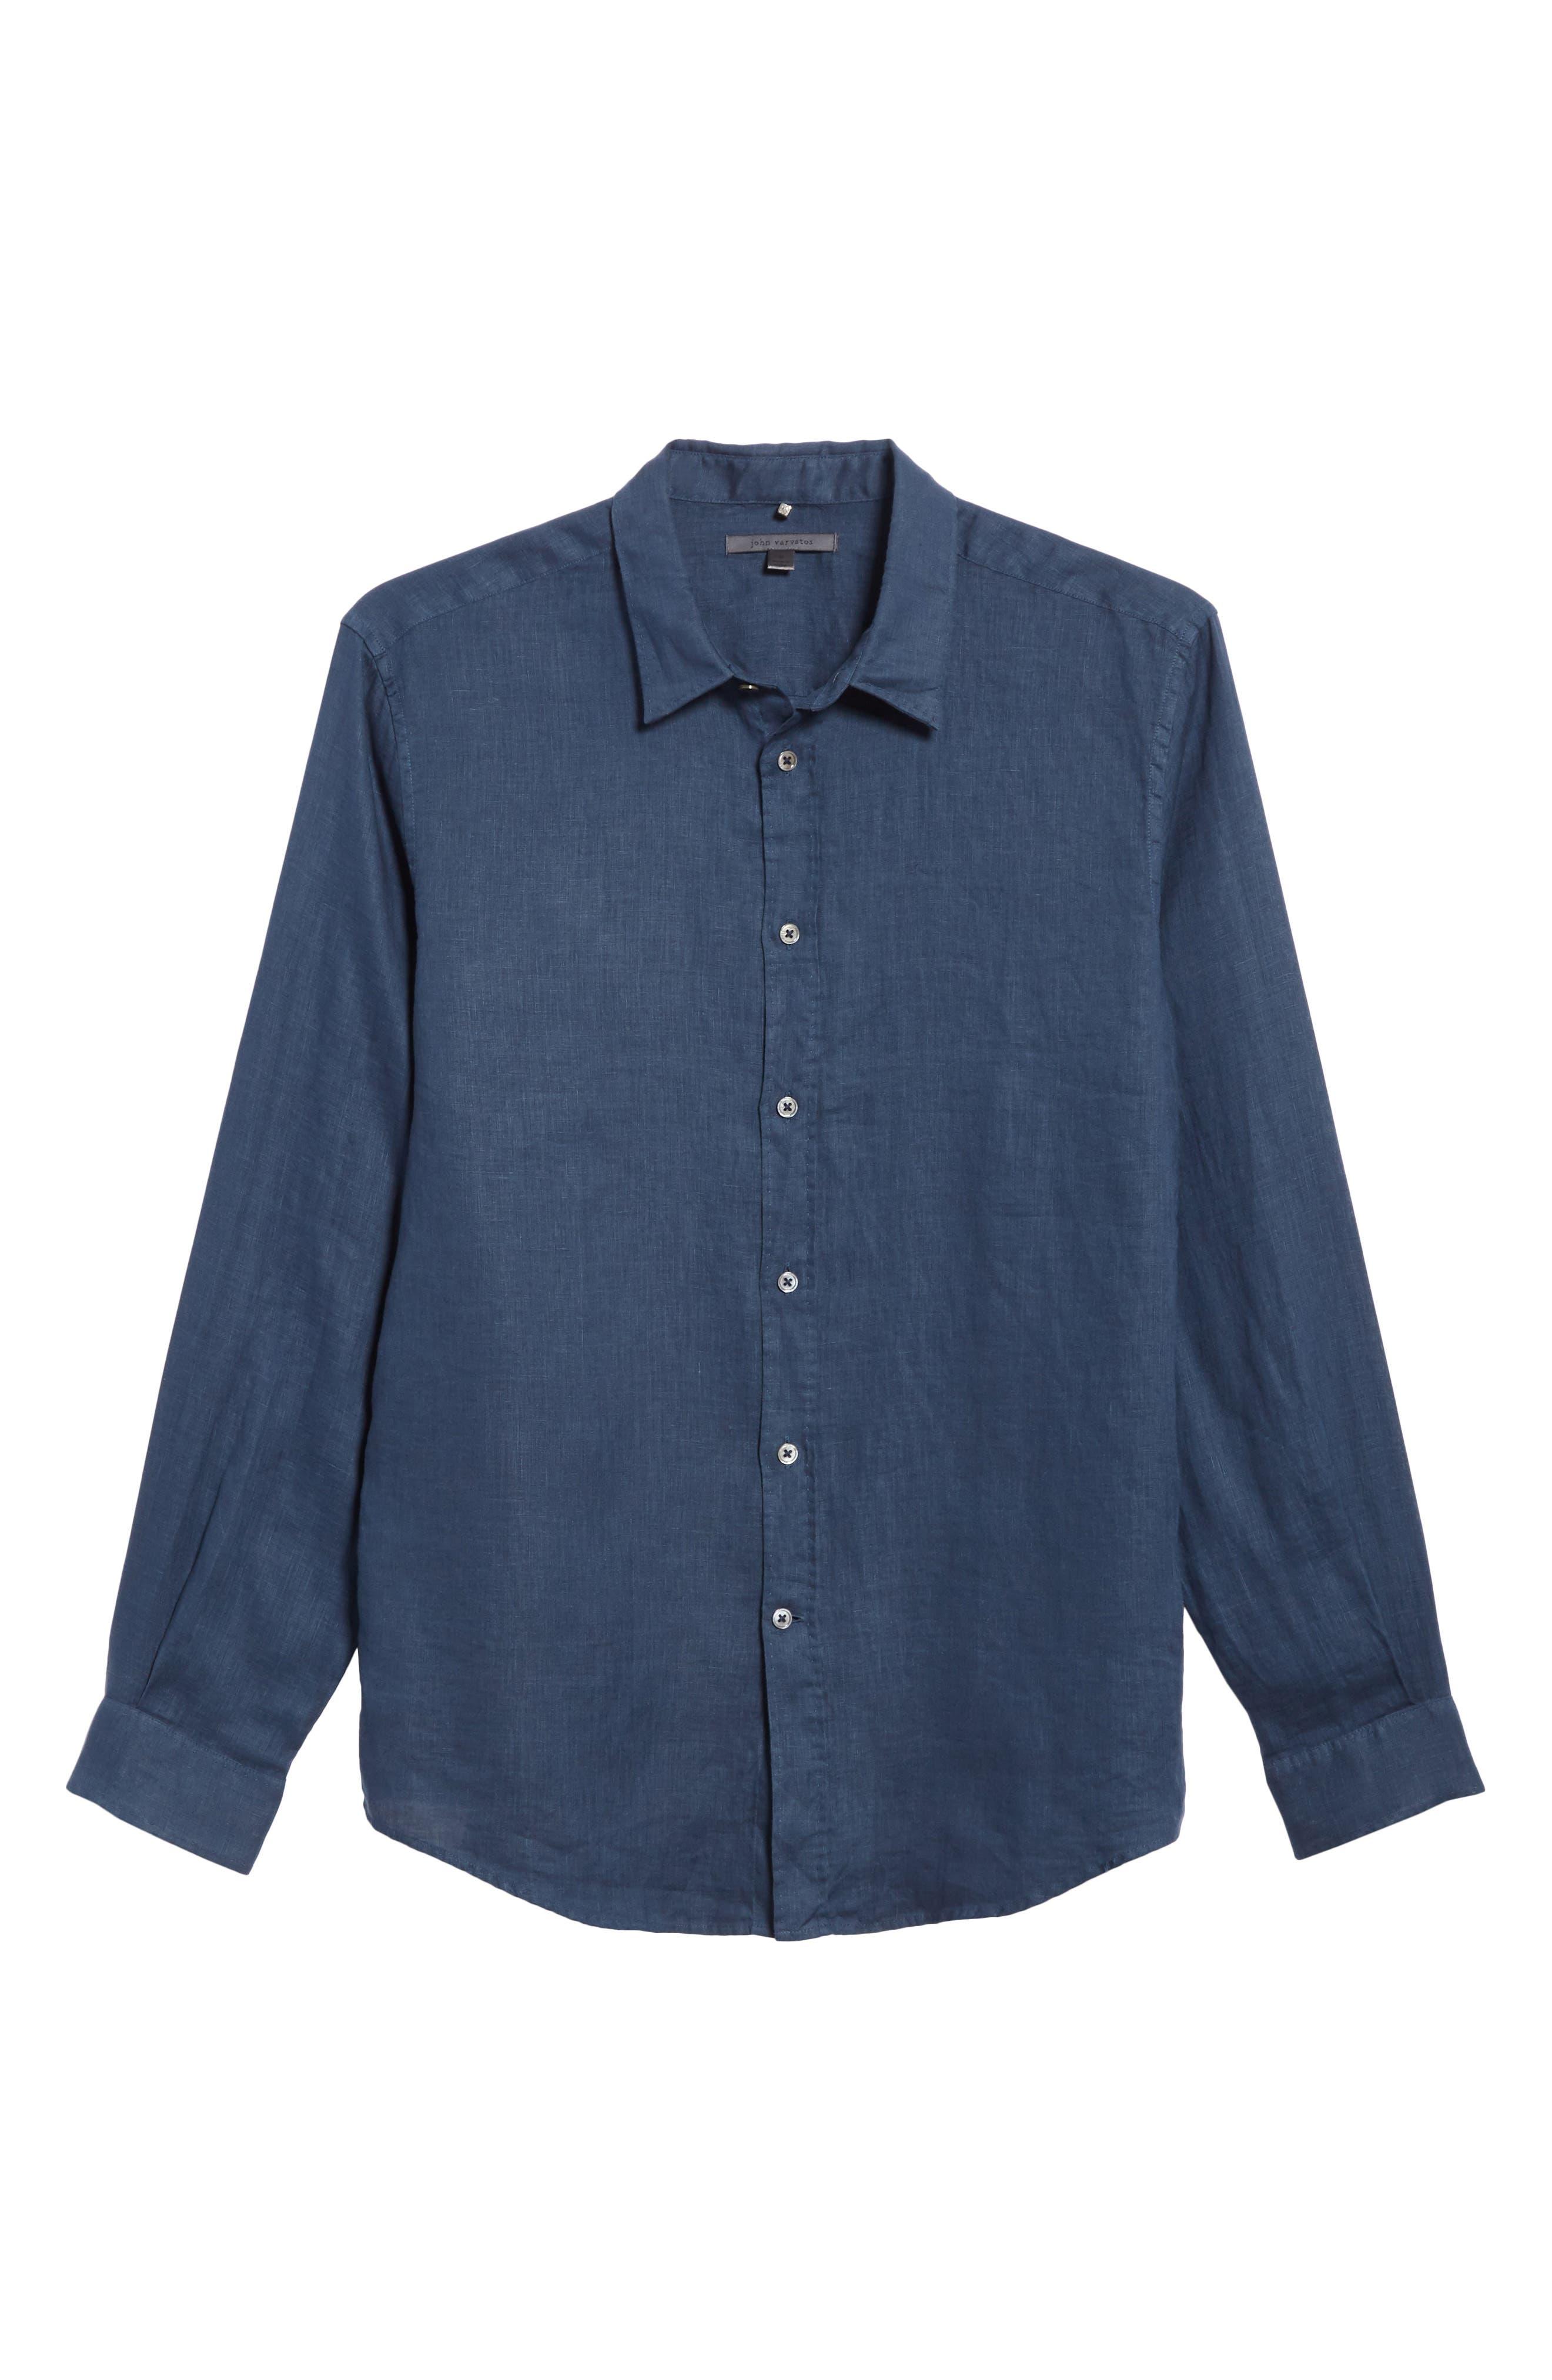 Collection Garment Dyed Linen Shirt,                             Alternate thumbnail 6, color,                             Lake Blue